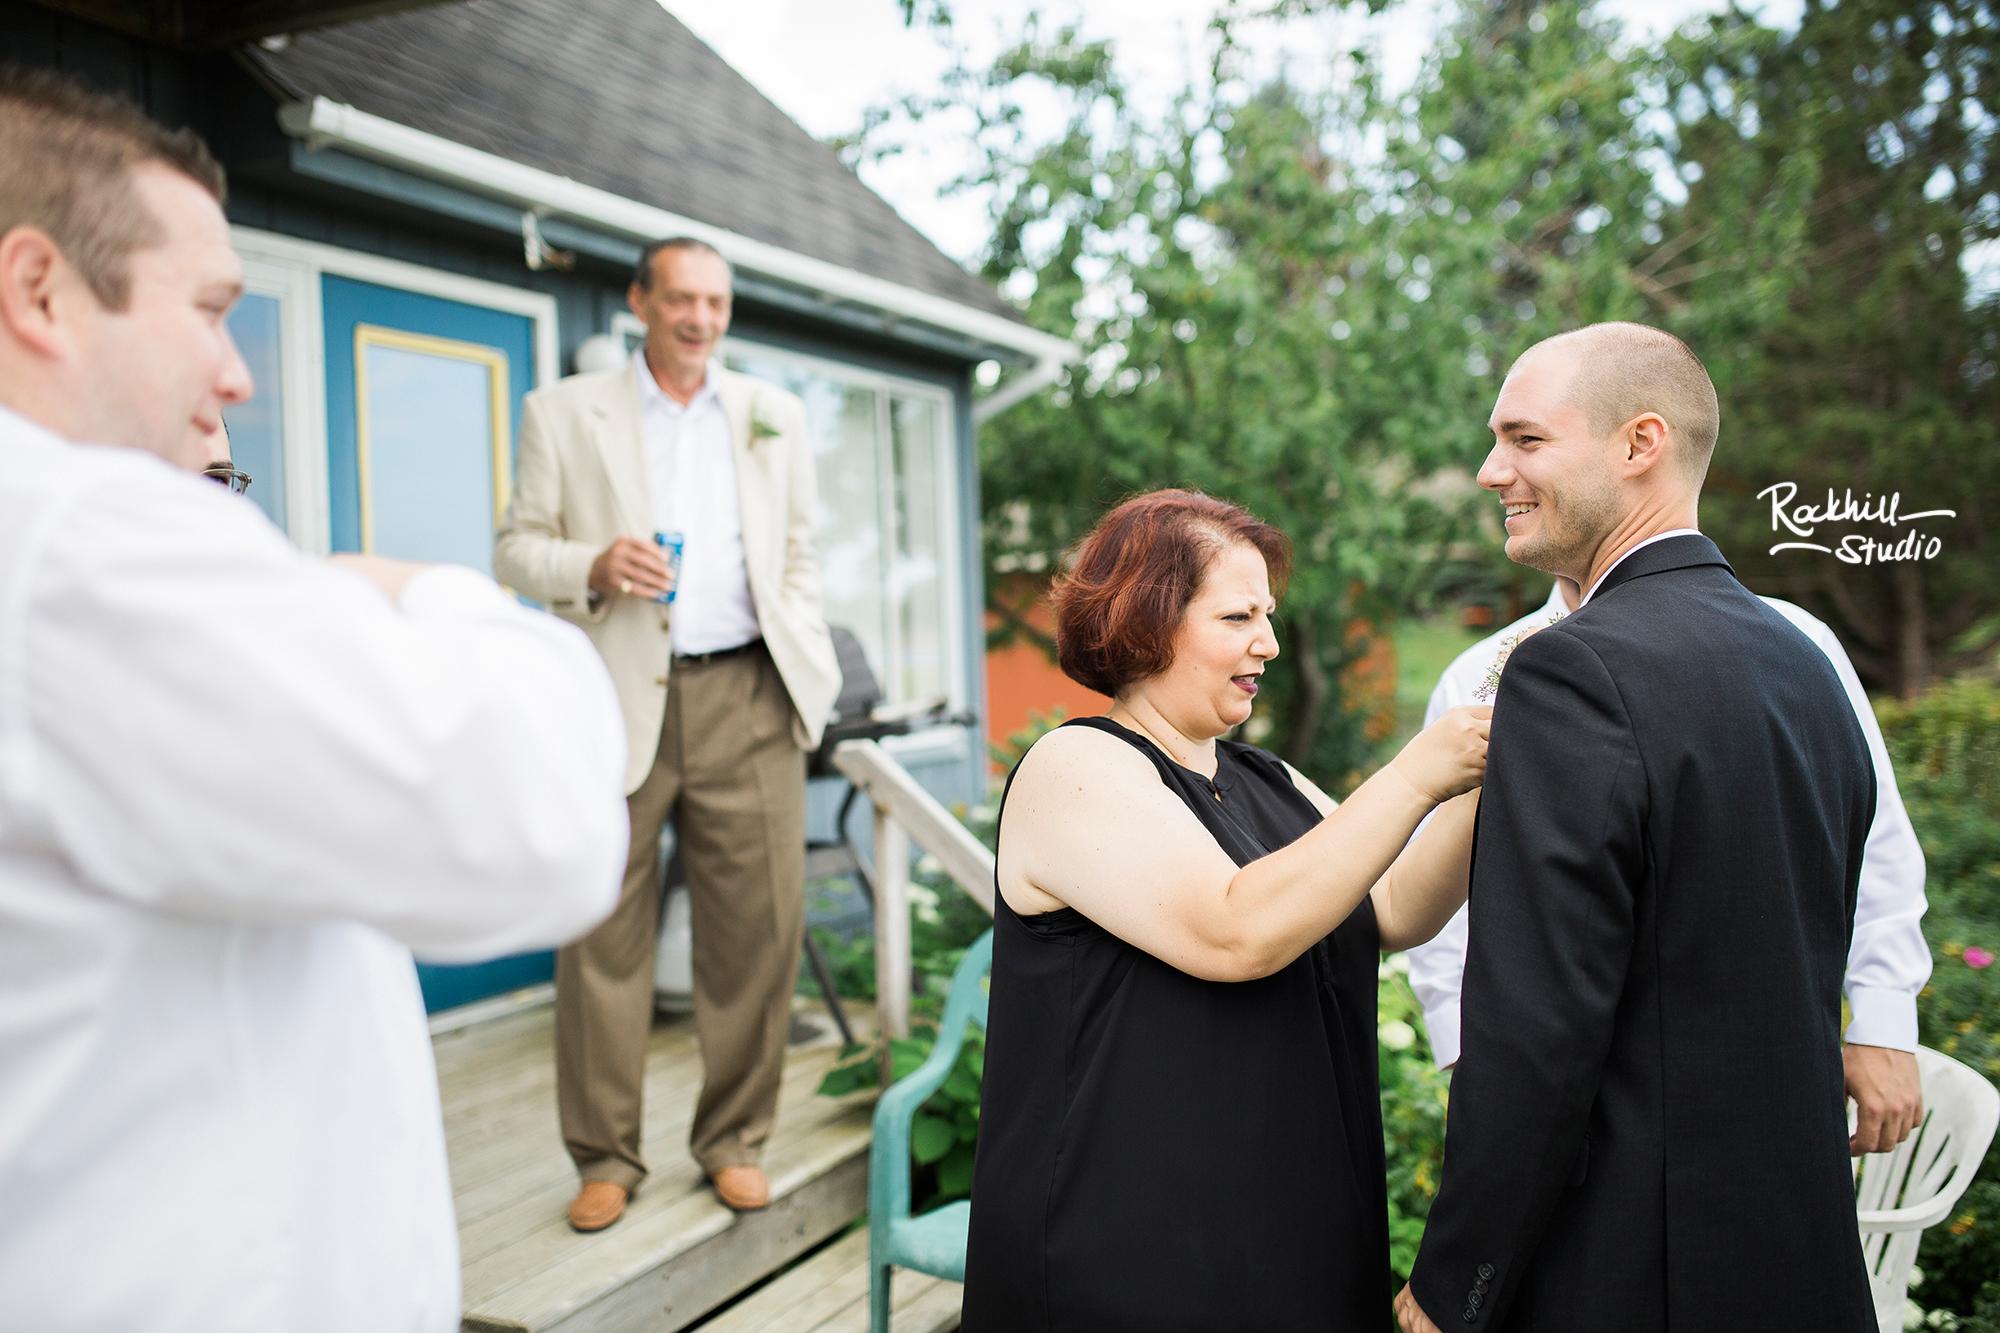 grand-marais-wedding-photographer-upper-peninsula-northern-michigan-rockhill-22.jpg